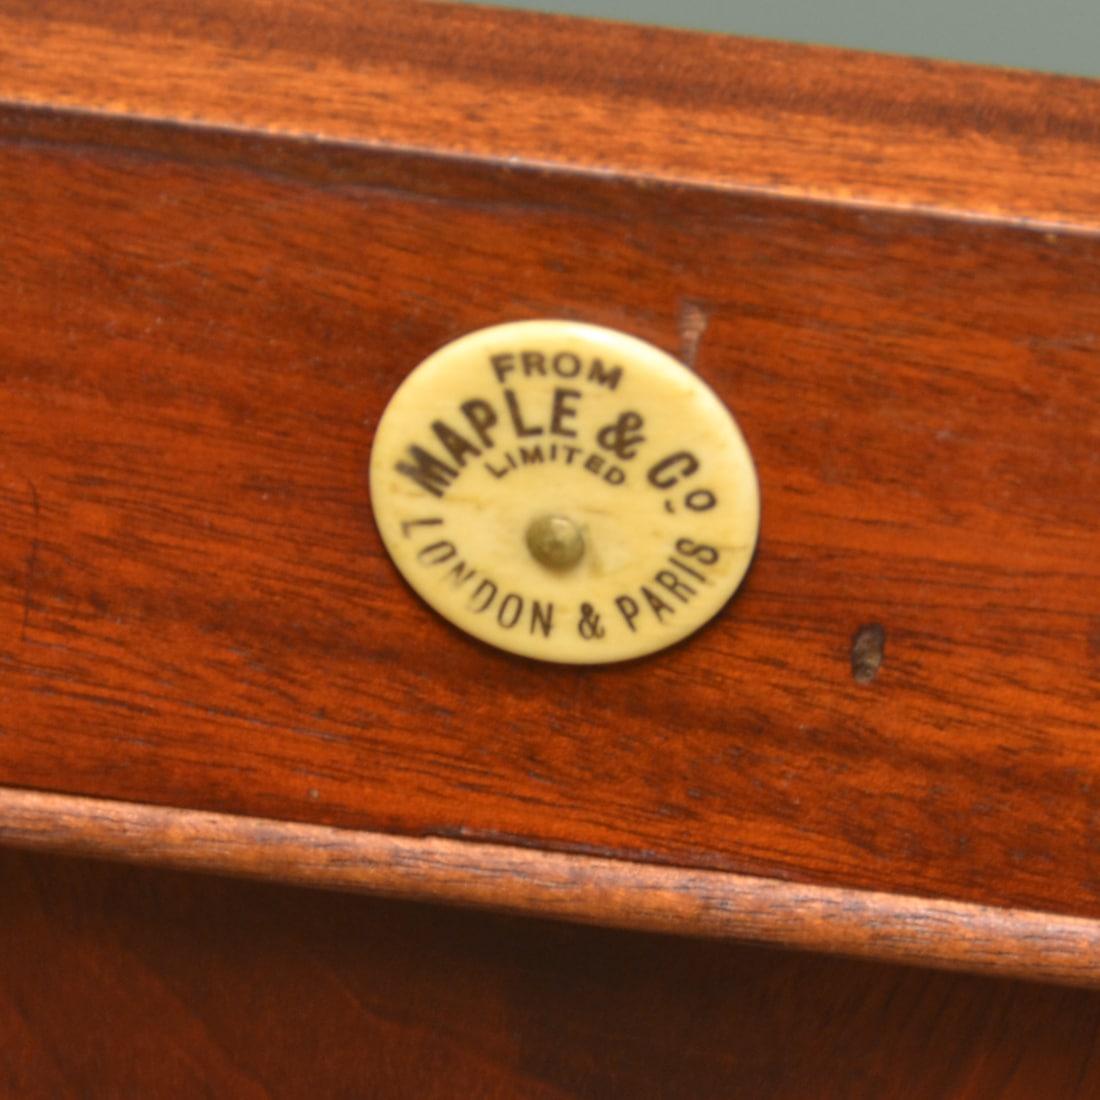 Circular Maple & Co Stamp